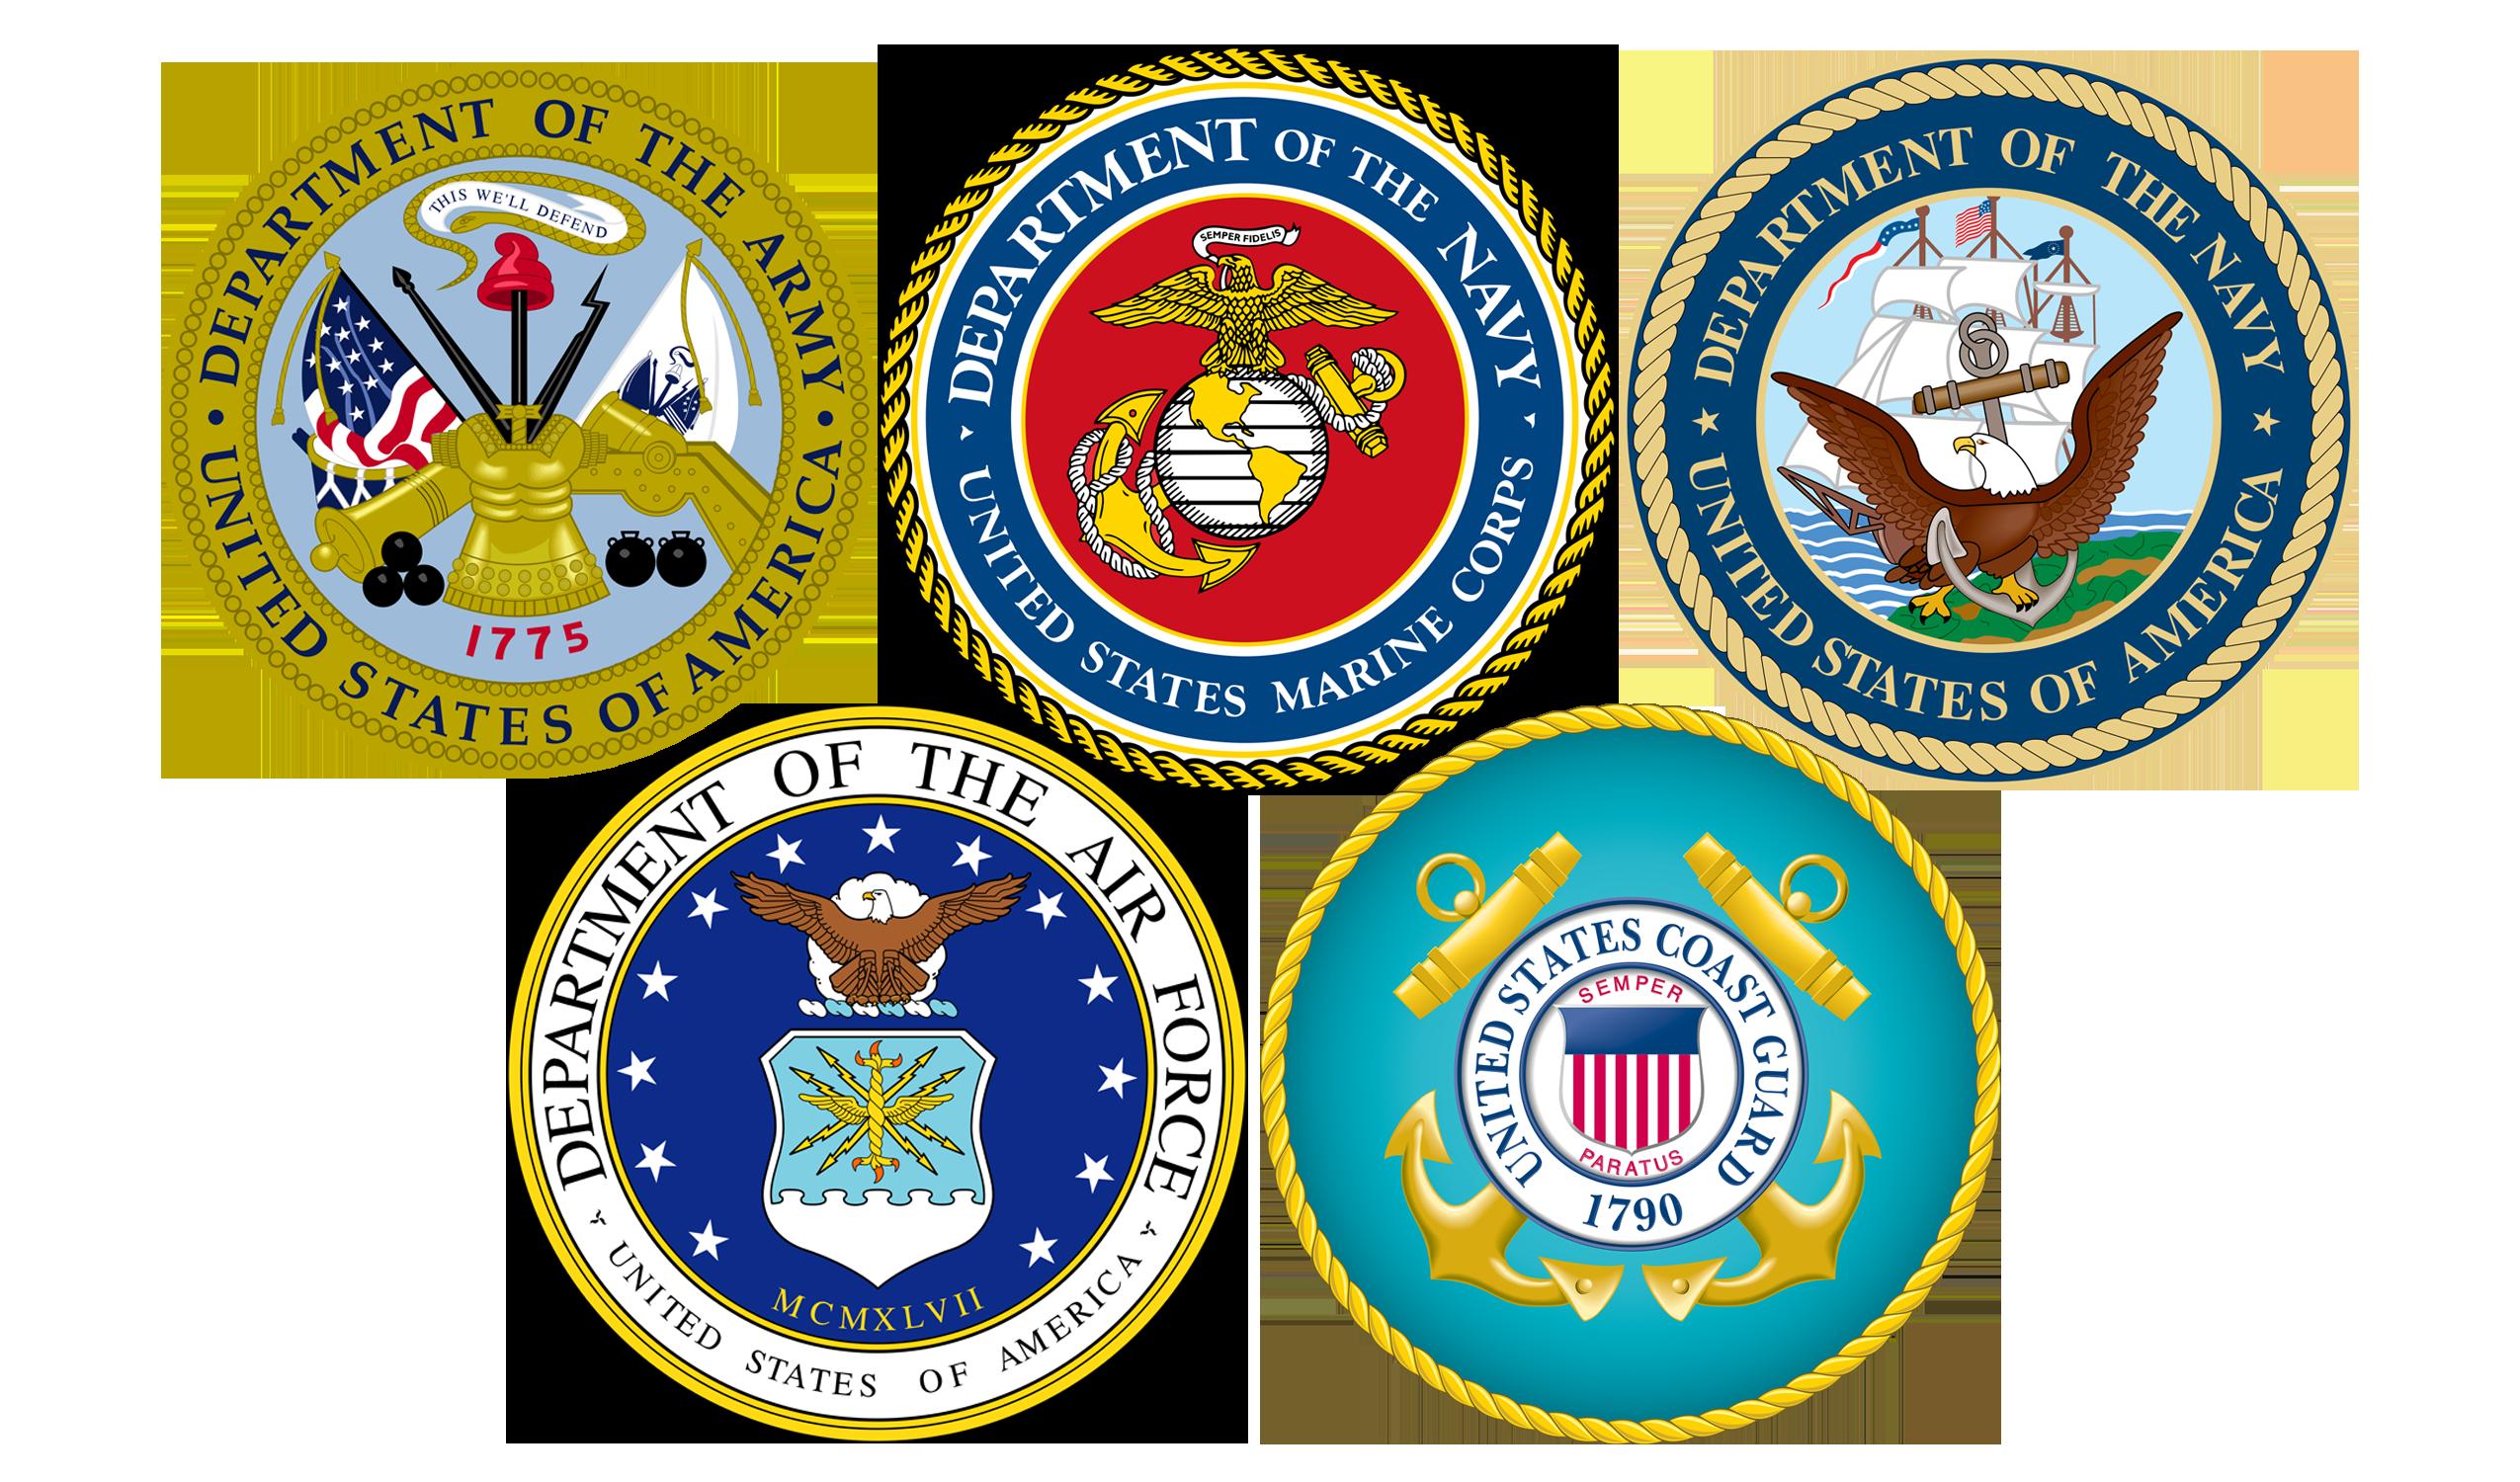 Military emblems implying veteran friendly trucking company.